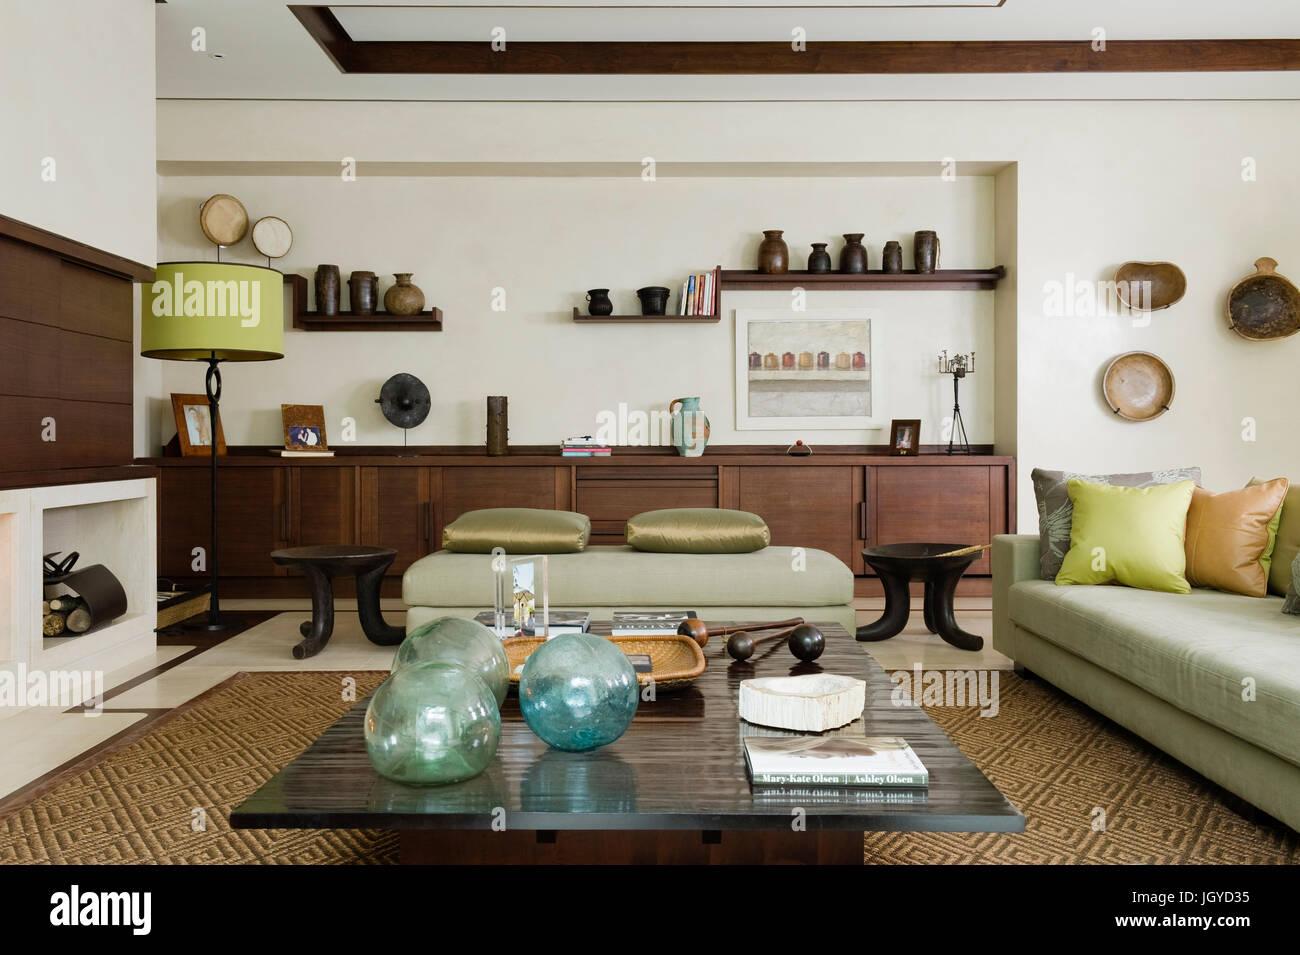 Grunes Sofa Im Wohnzimmer Stockfoto Bild 148120425 Alamy